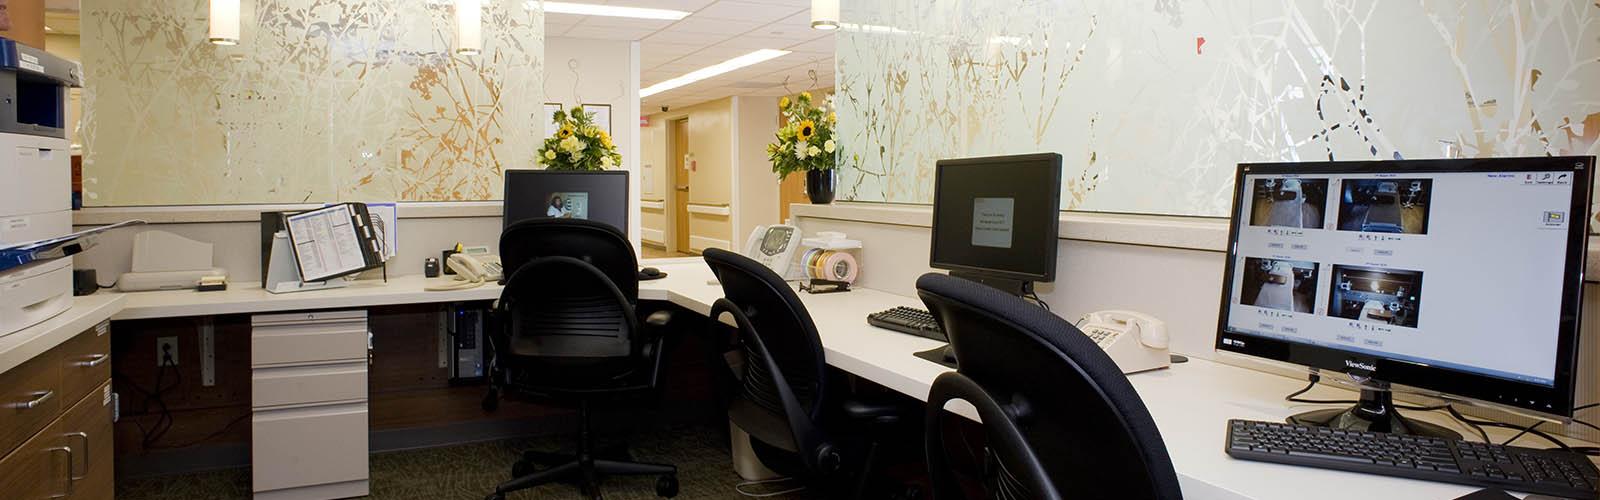 University of Missouri Health Care – 6th and 7th Floor - 6